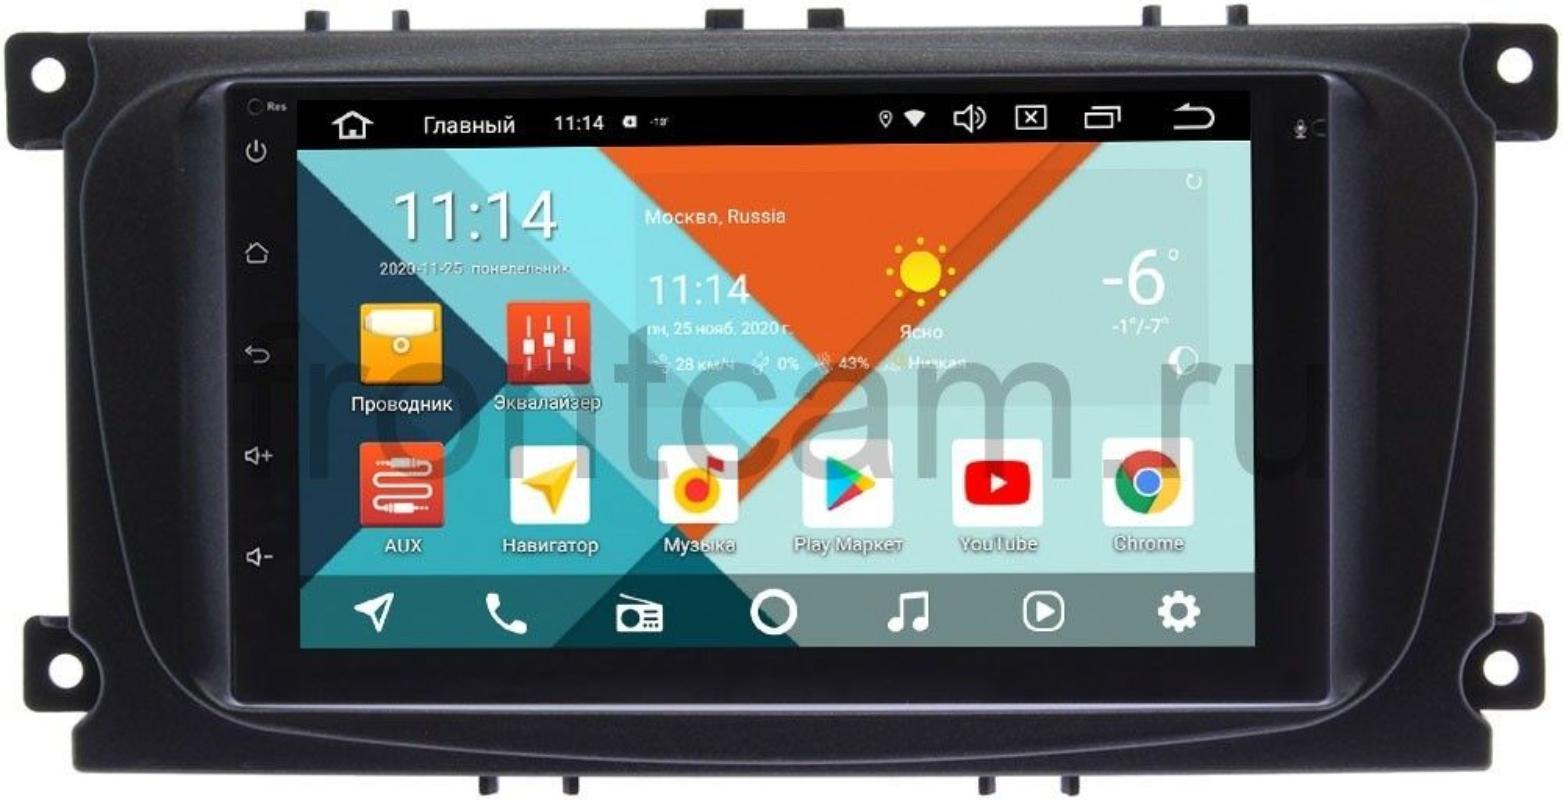 Магнитола в штатное место 2 din Ford Focus, C-Max, Mondeo 2008-2011 Wide Media KS7001QR-3/32-RP-FRCM-162 на Android 10 (DSP CarPlay 4G-SIM) (+ Камера заднего вида в подарок!)